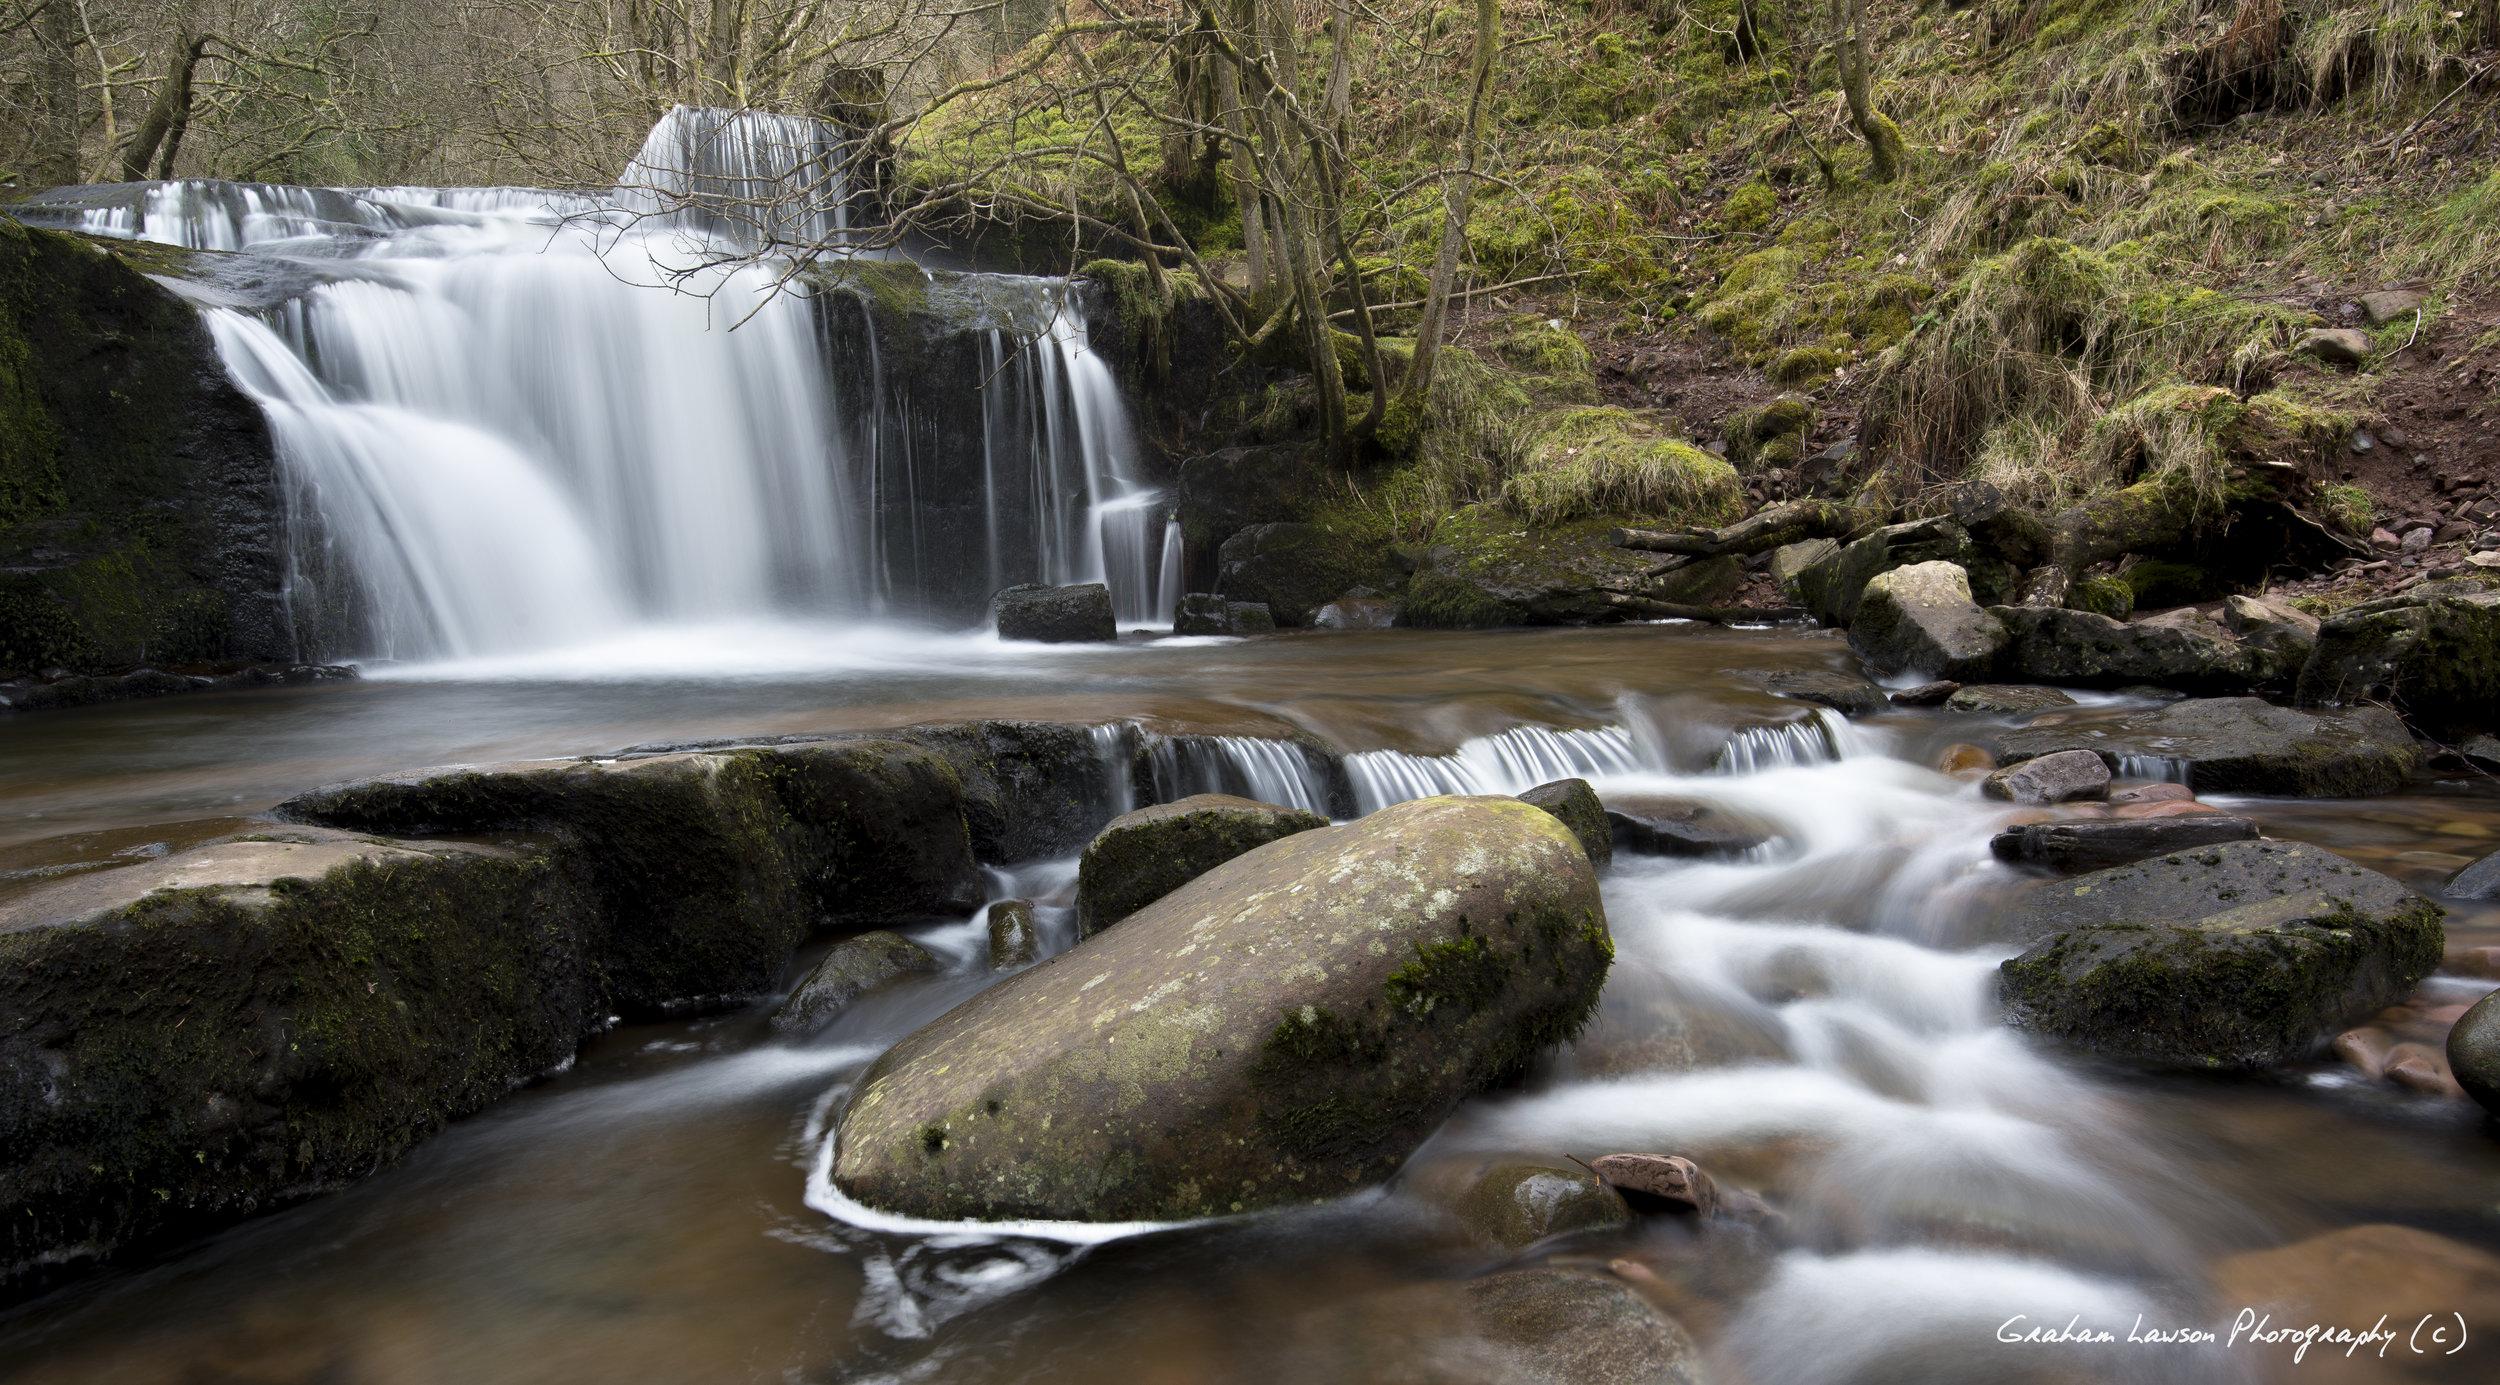 Talybont Waterfall